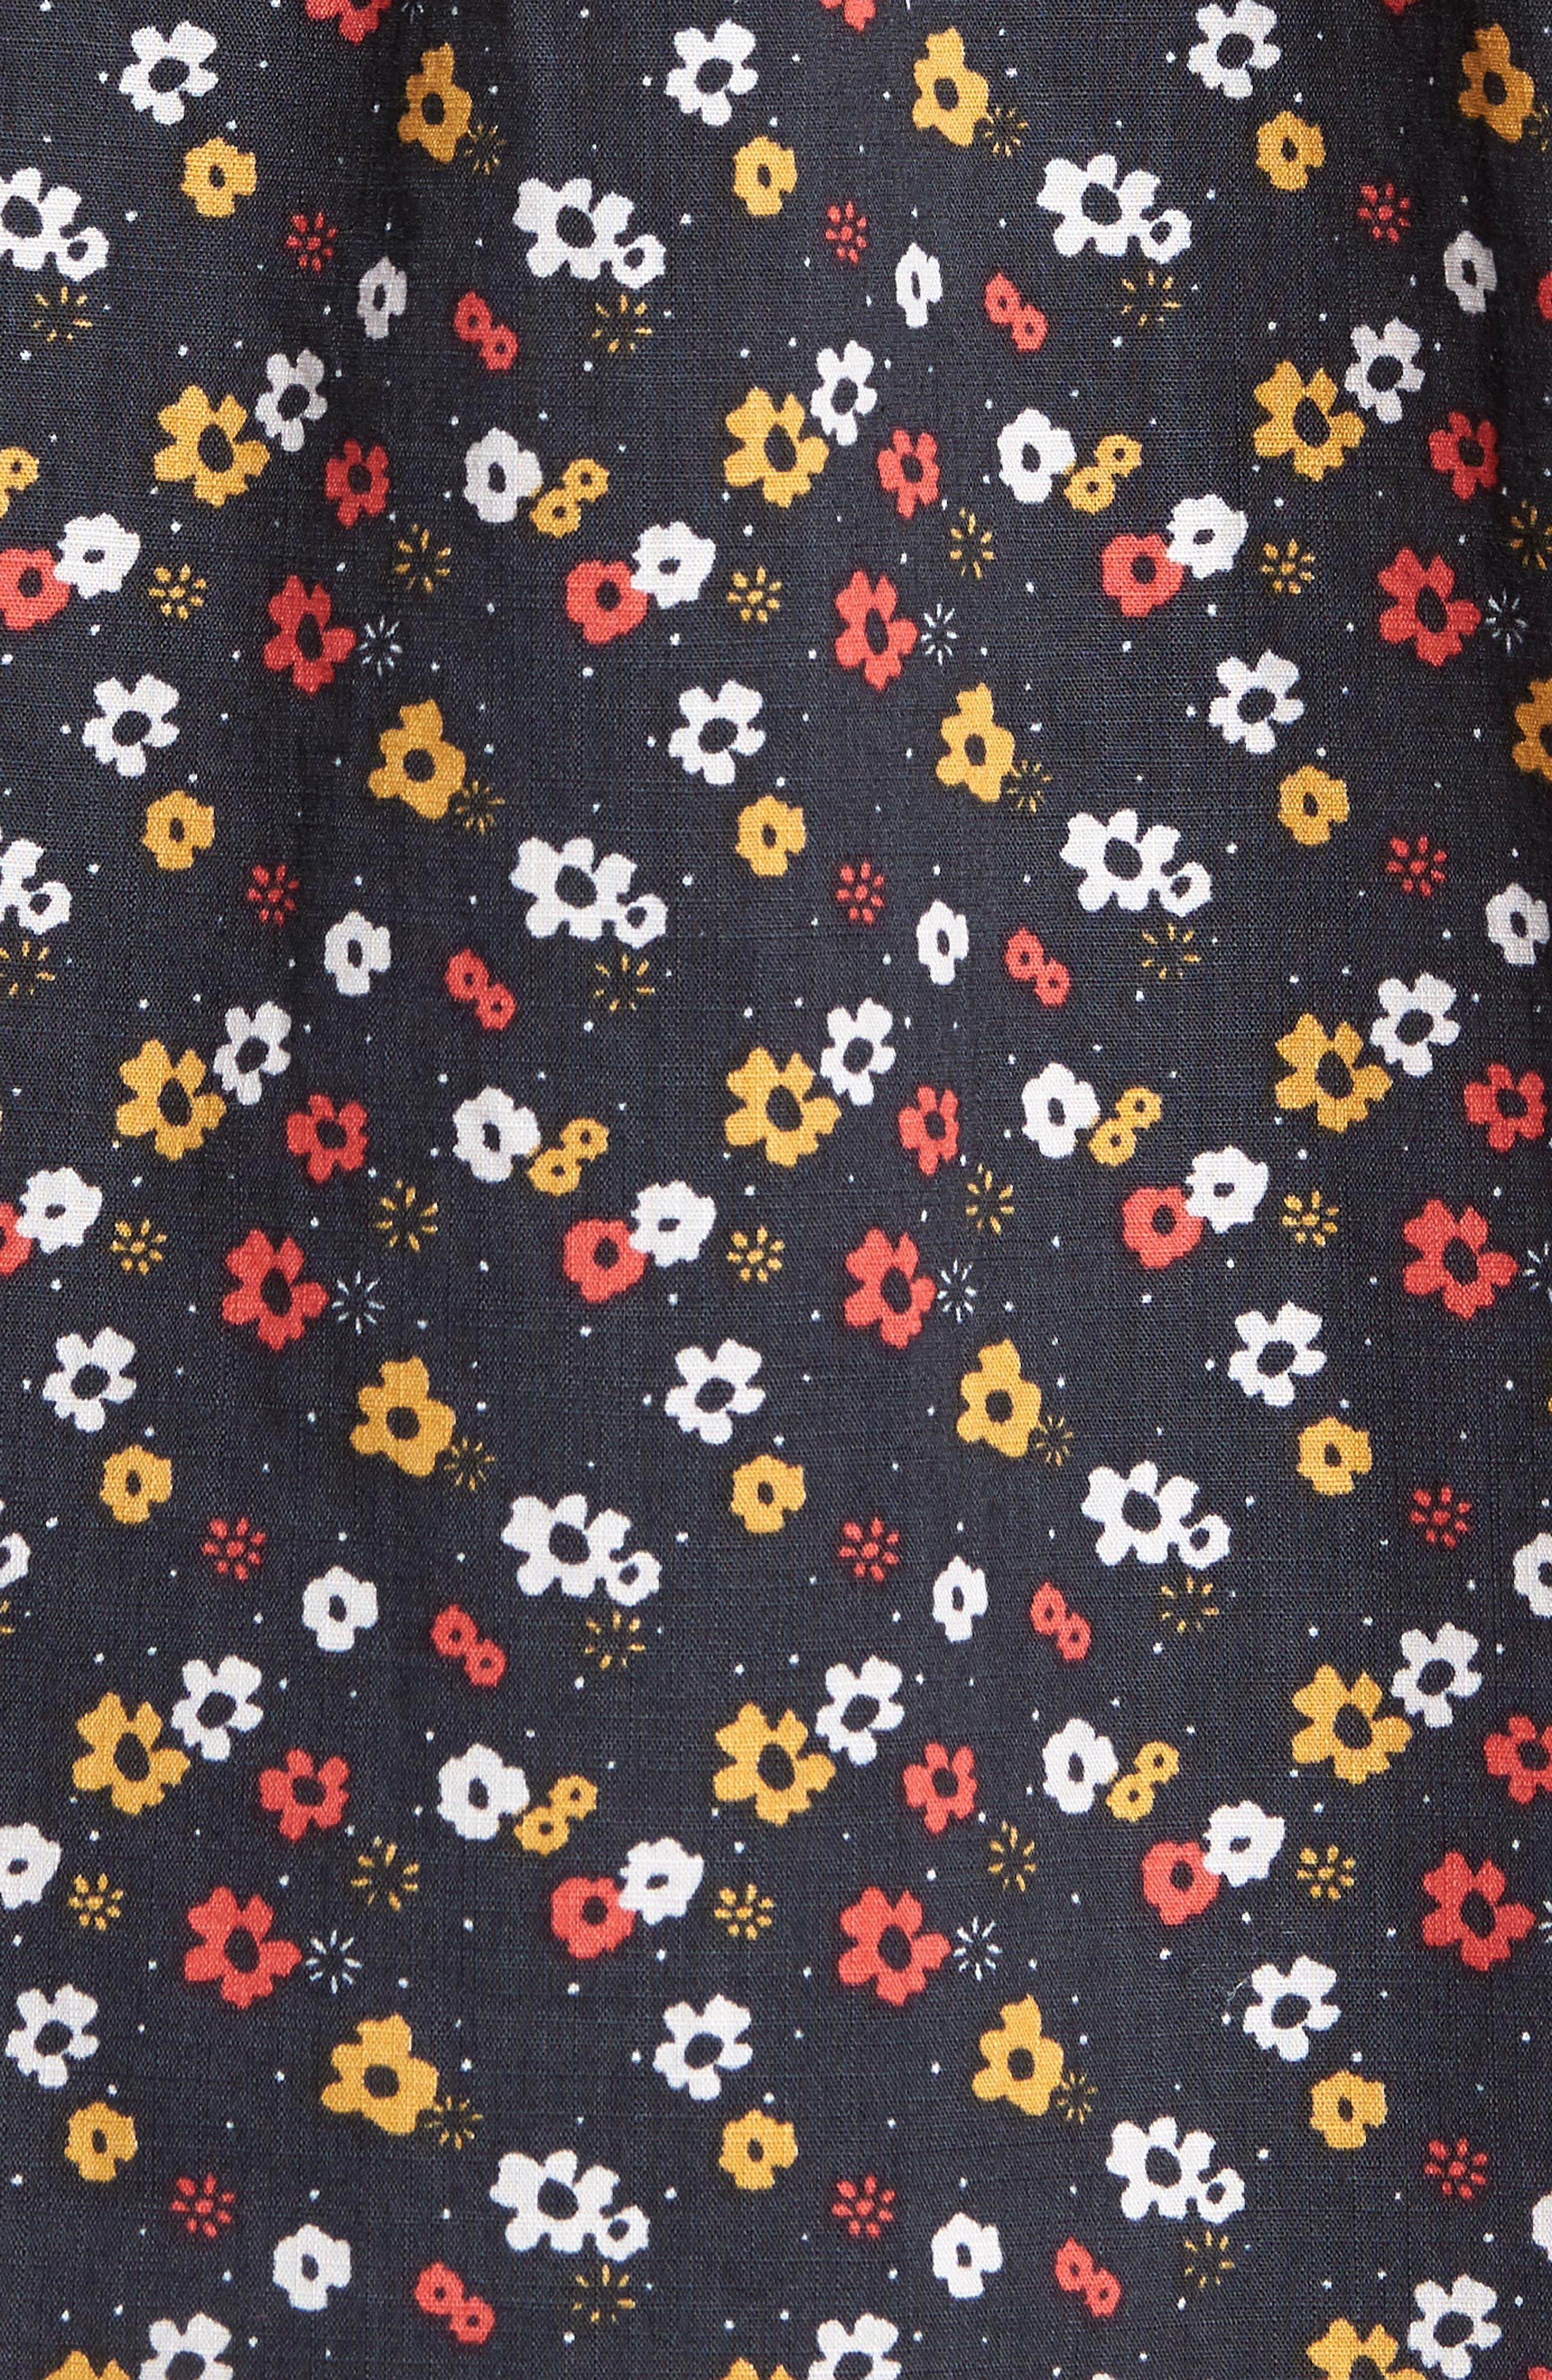 Scopic Woven Shirt,                             Alternate thumbnail 13, color,